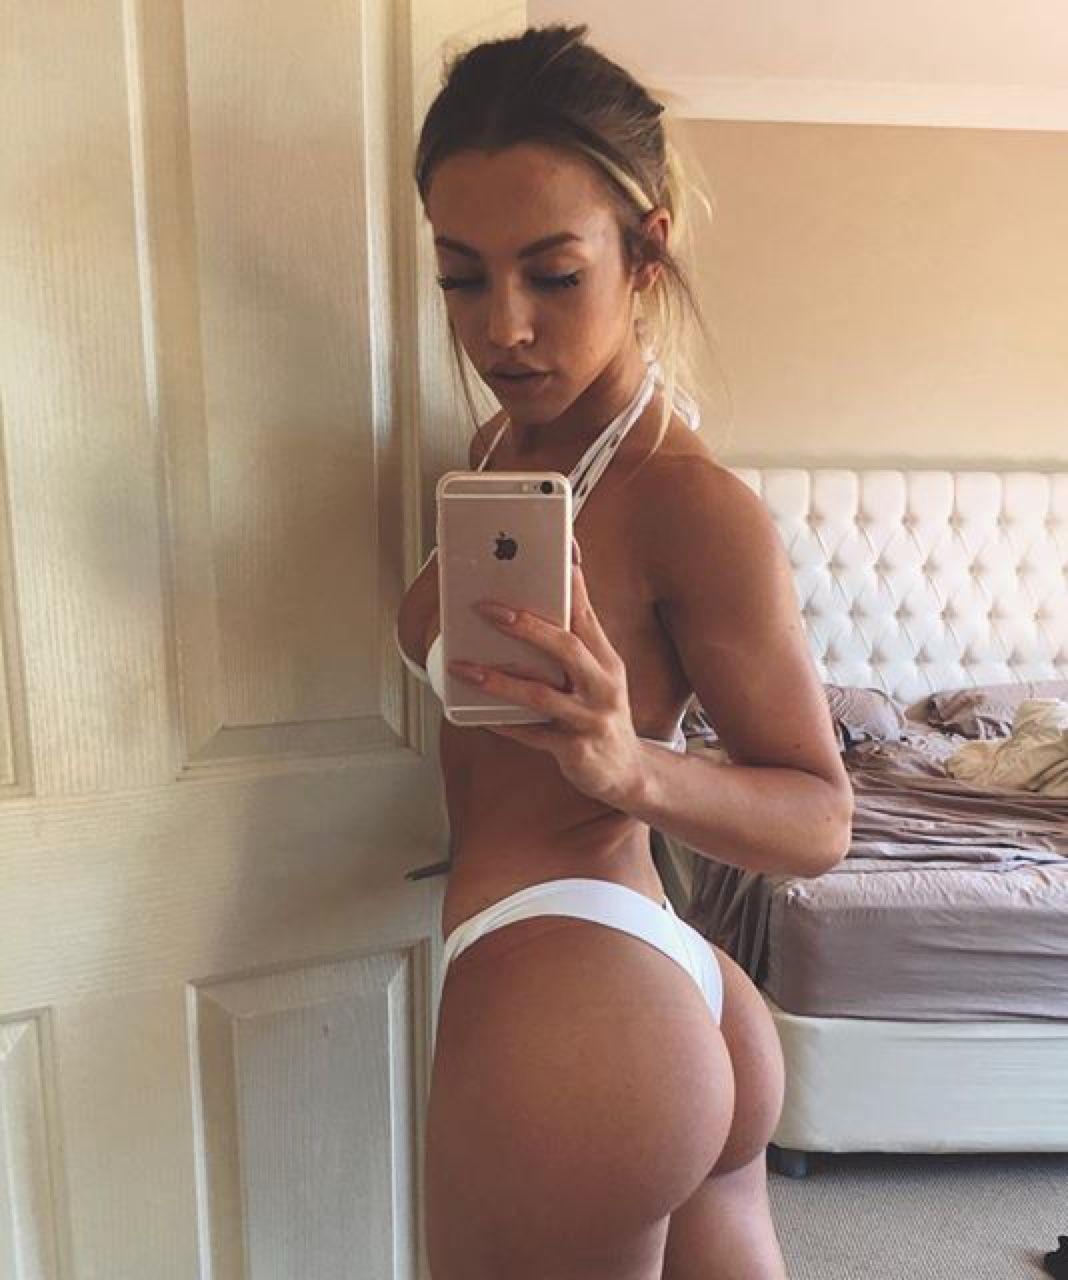 Ass Tammy nude (71 photos), Ass, Cleavage, Instagram, legs 2017